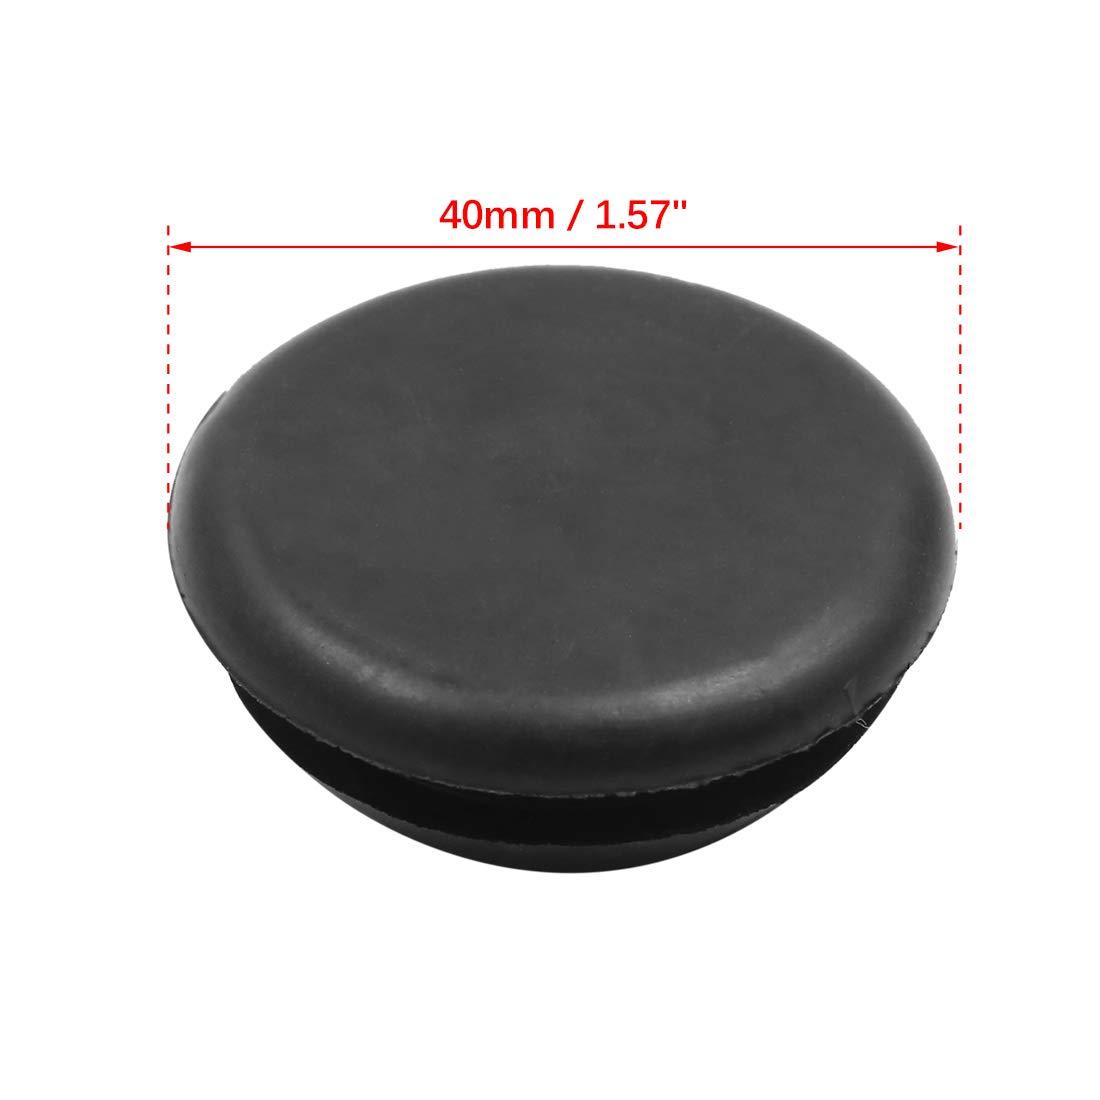 uxcell Car Rubber Grommet Plug Flush Mount Wire Gasket Interior 40mm x 15mm Black 2pcs